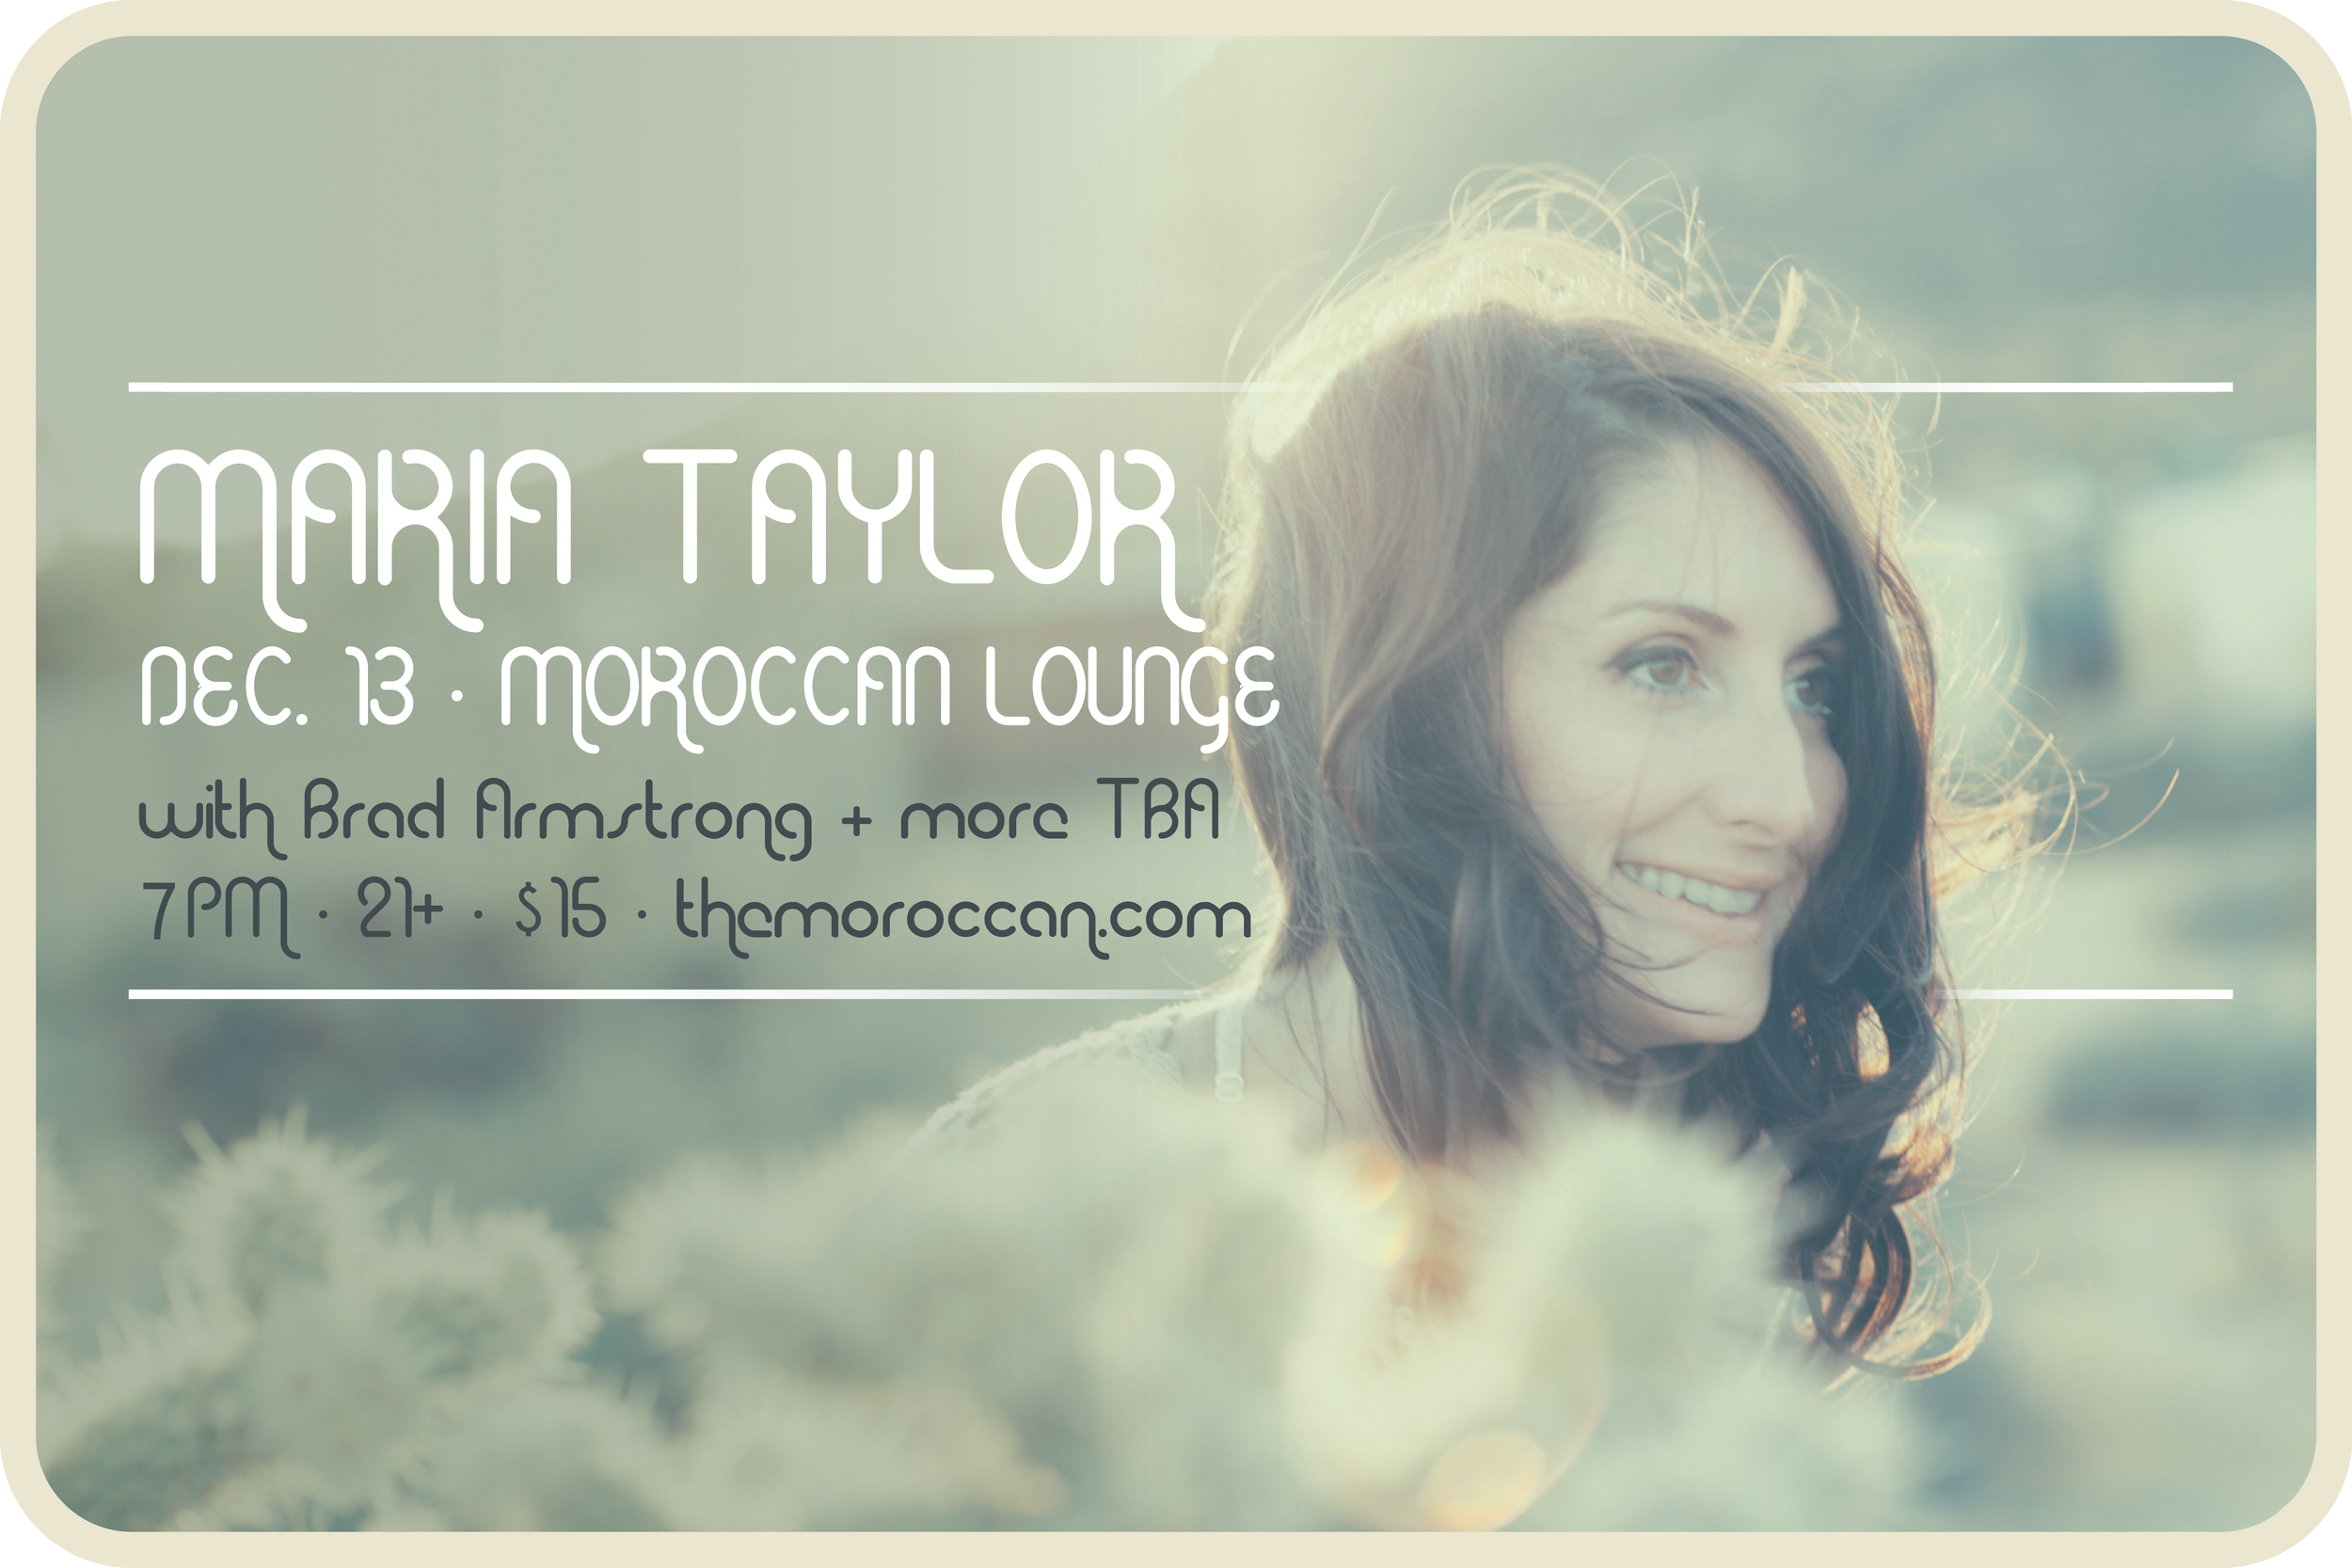 Maria Taylor - Dec 13 Moroccan Lounge FLYER.png